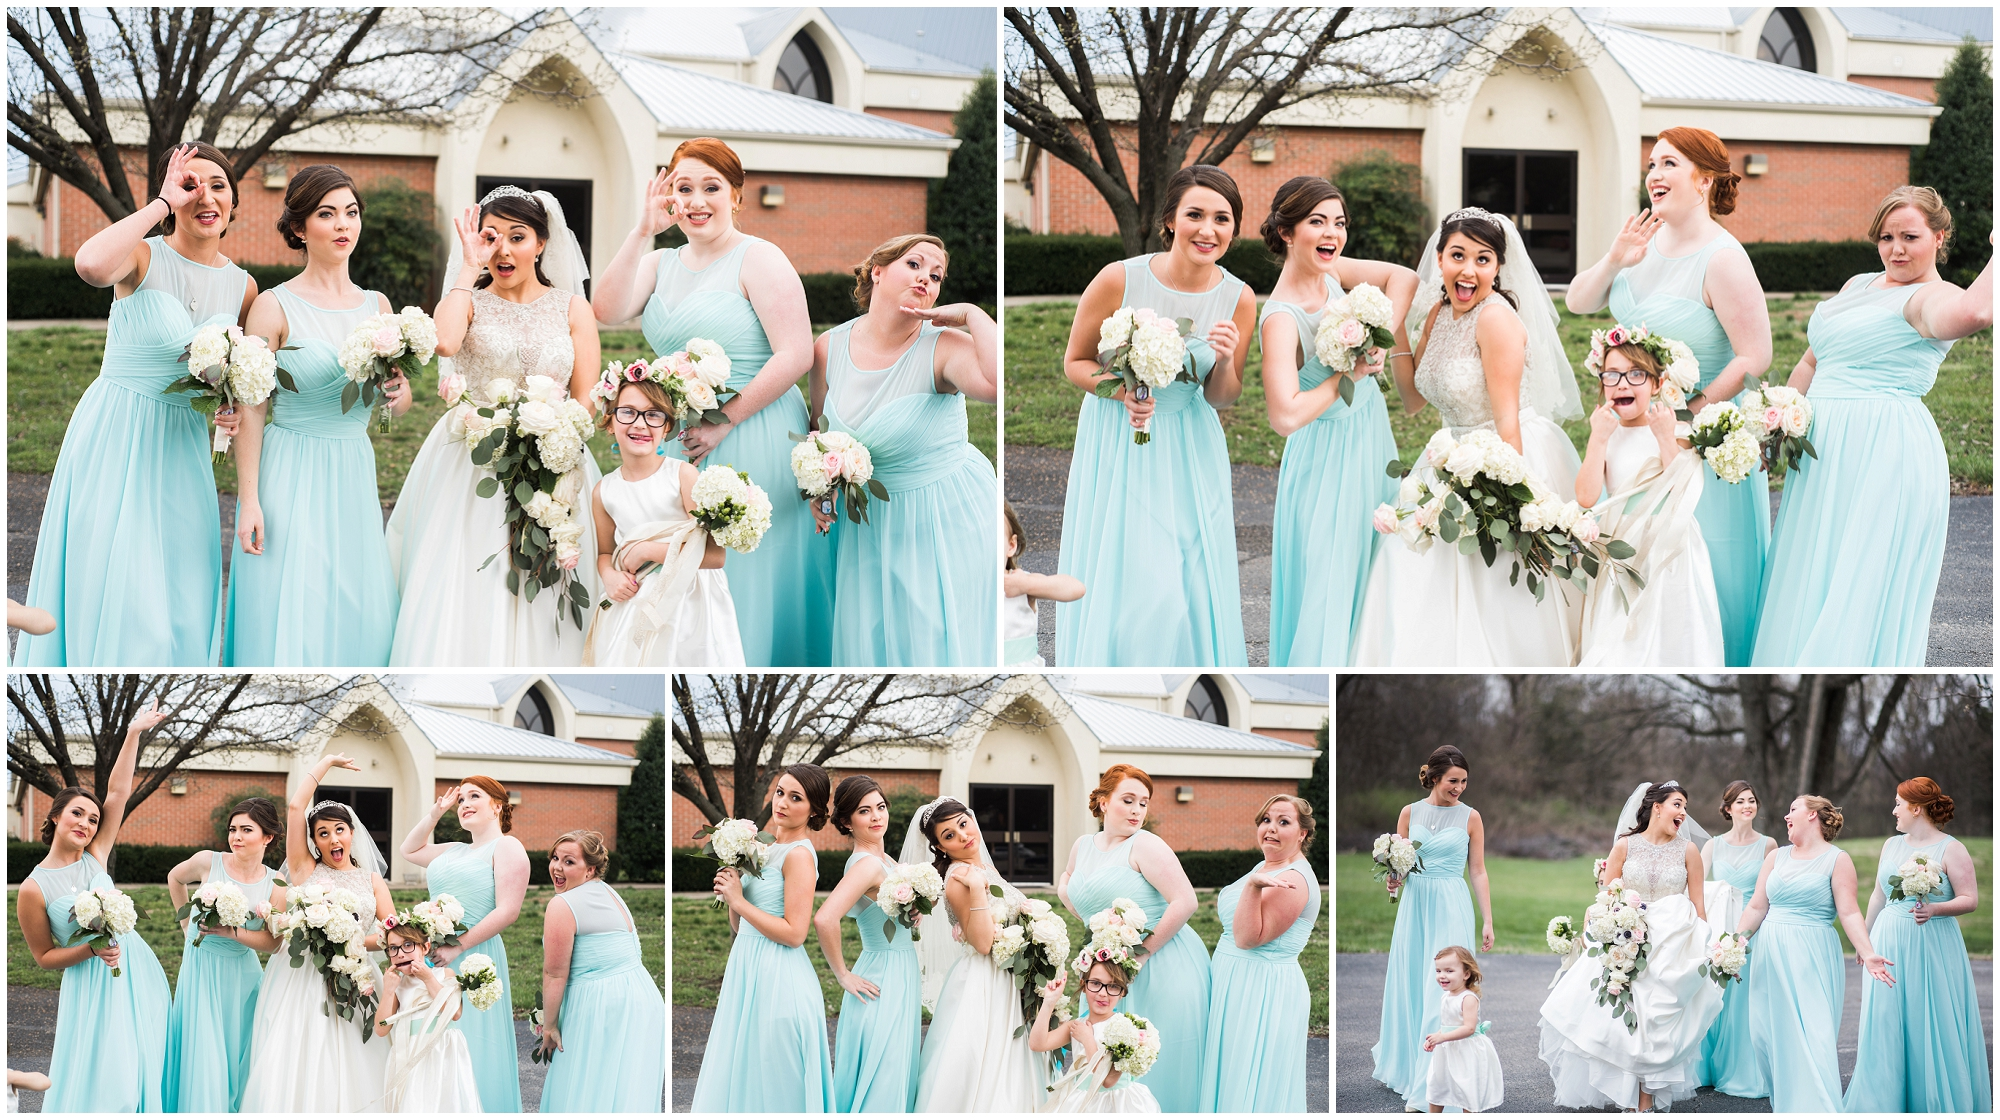 lyndsey_caleb_wedding_indian_hills-3463.jpg